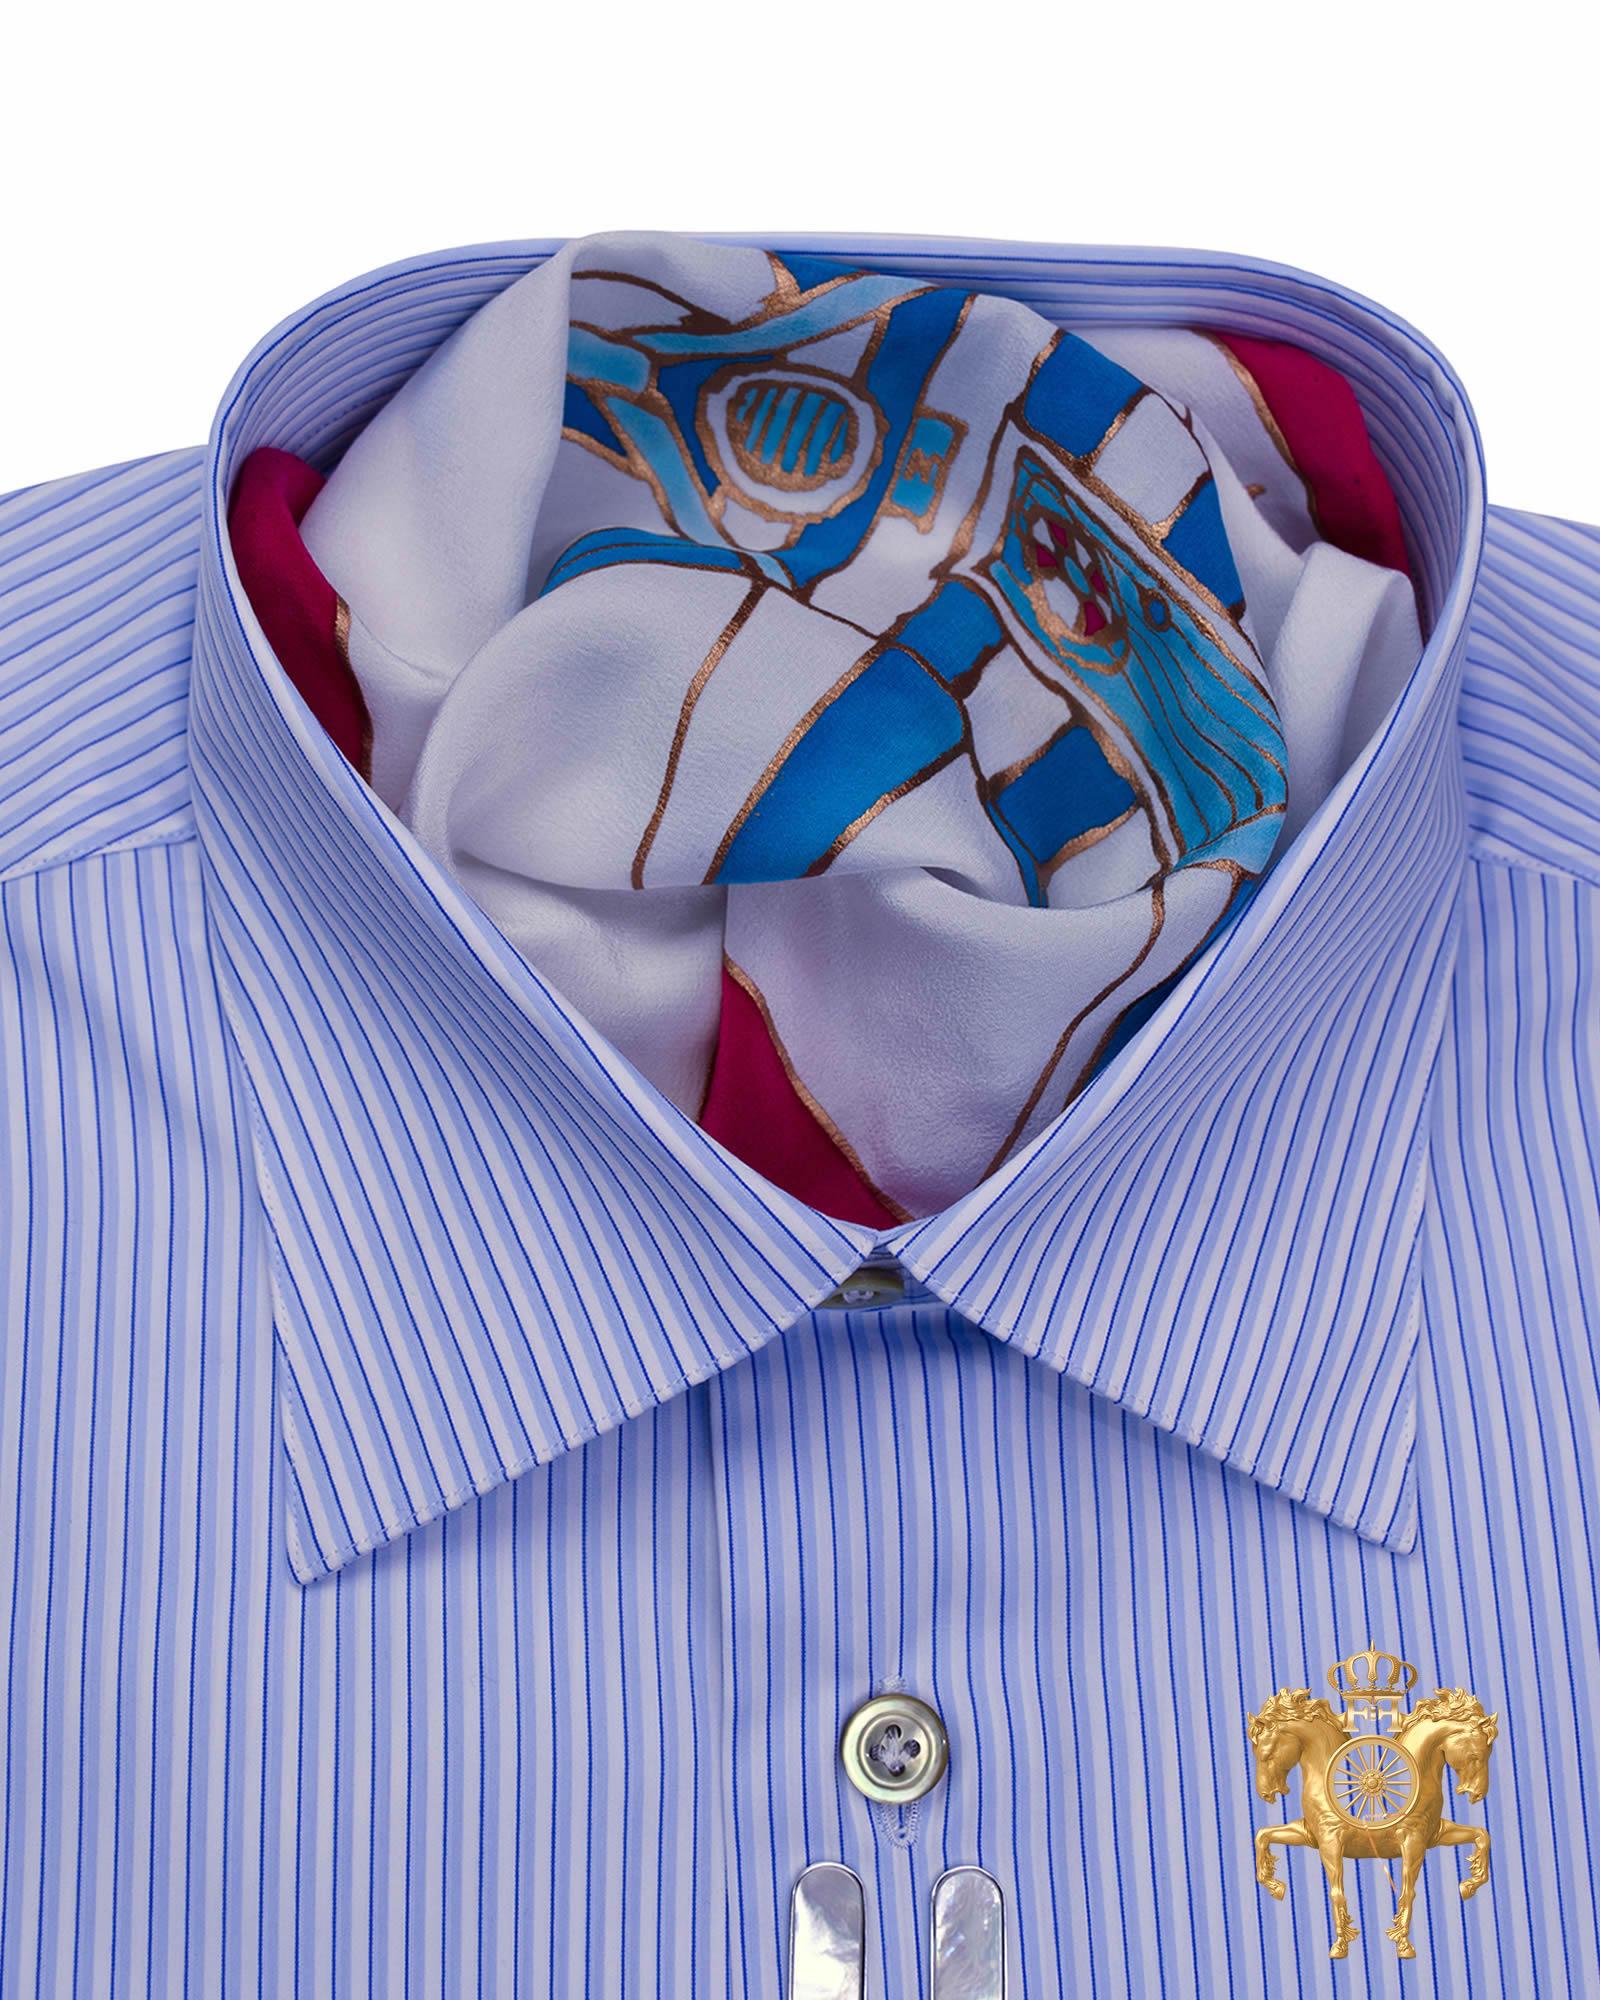 Quality Mens Dress Shirts Vancouver The Dress Shirt Guide Luxury